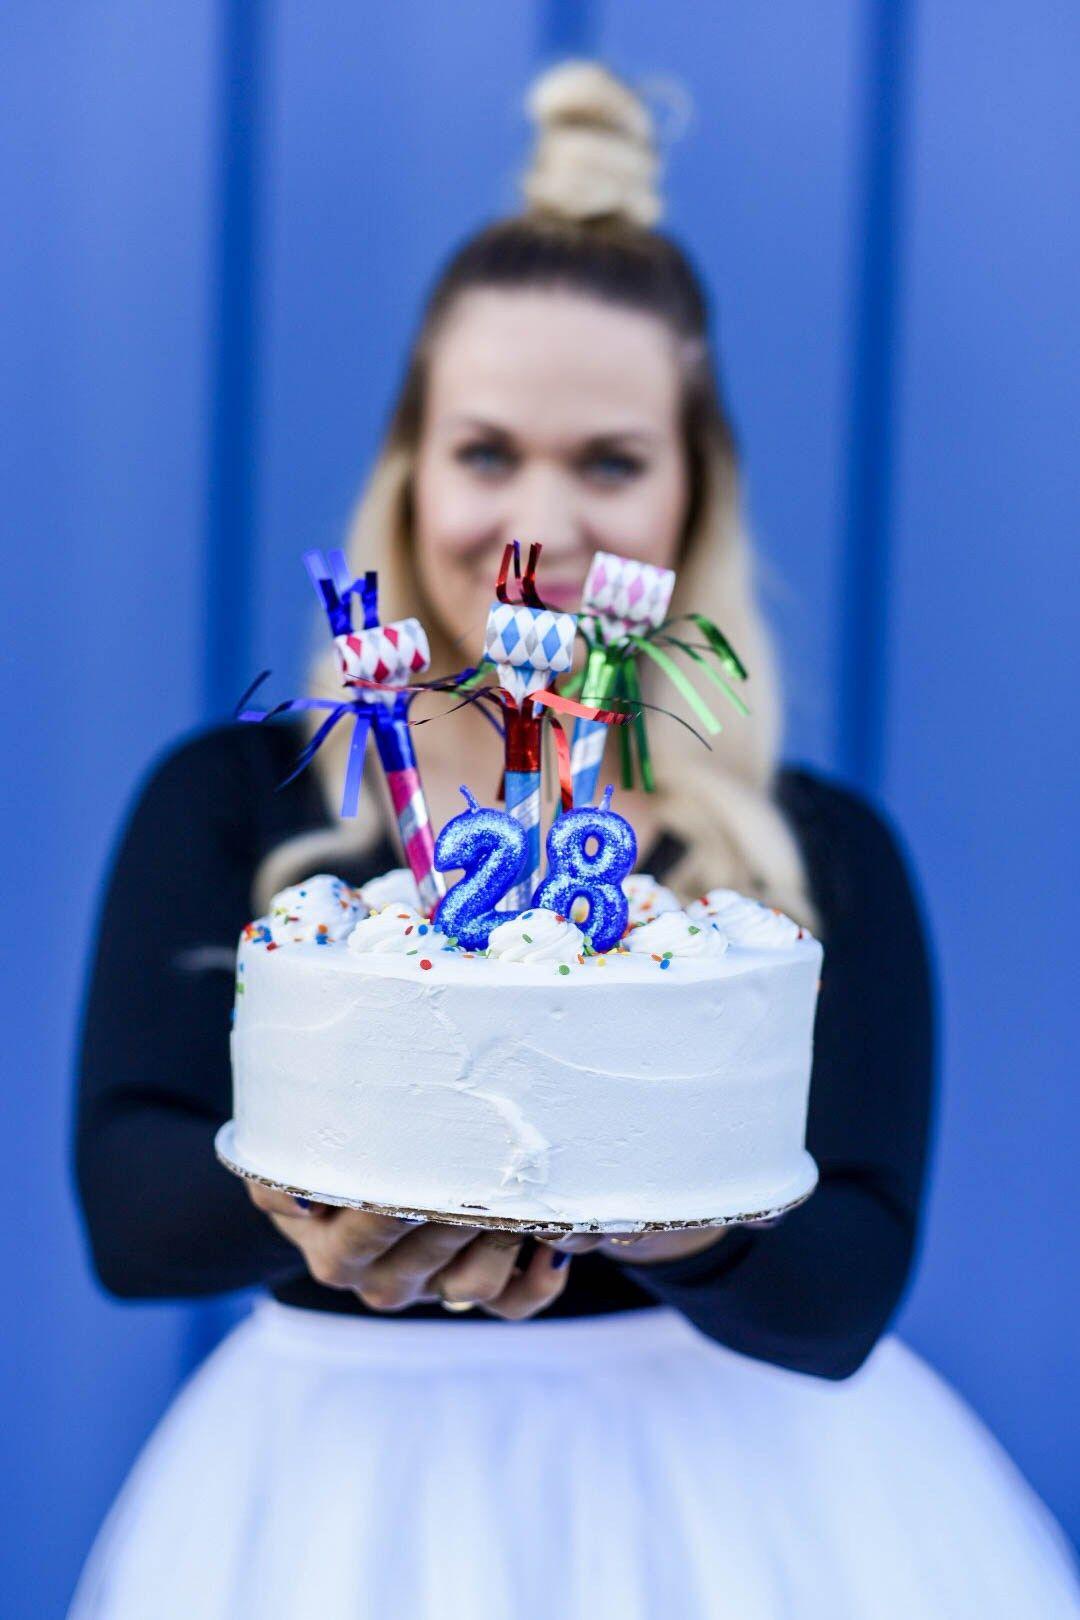 28th Birthday 28th birthday, Birthday photography